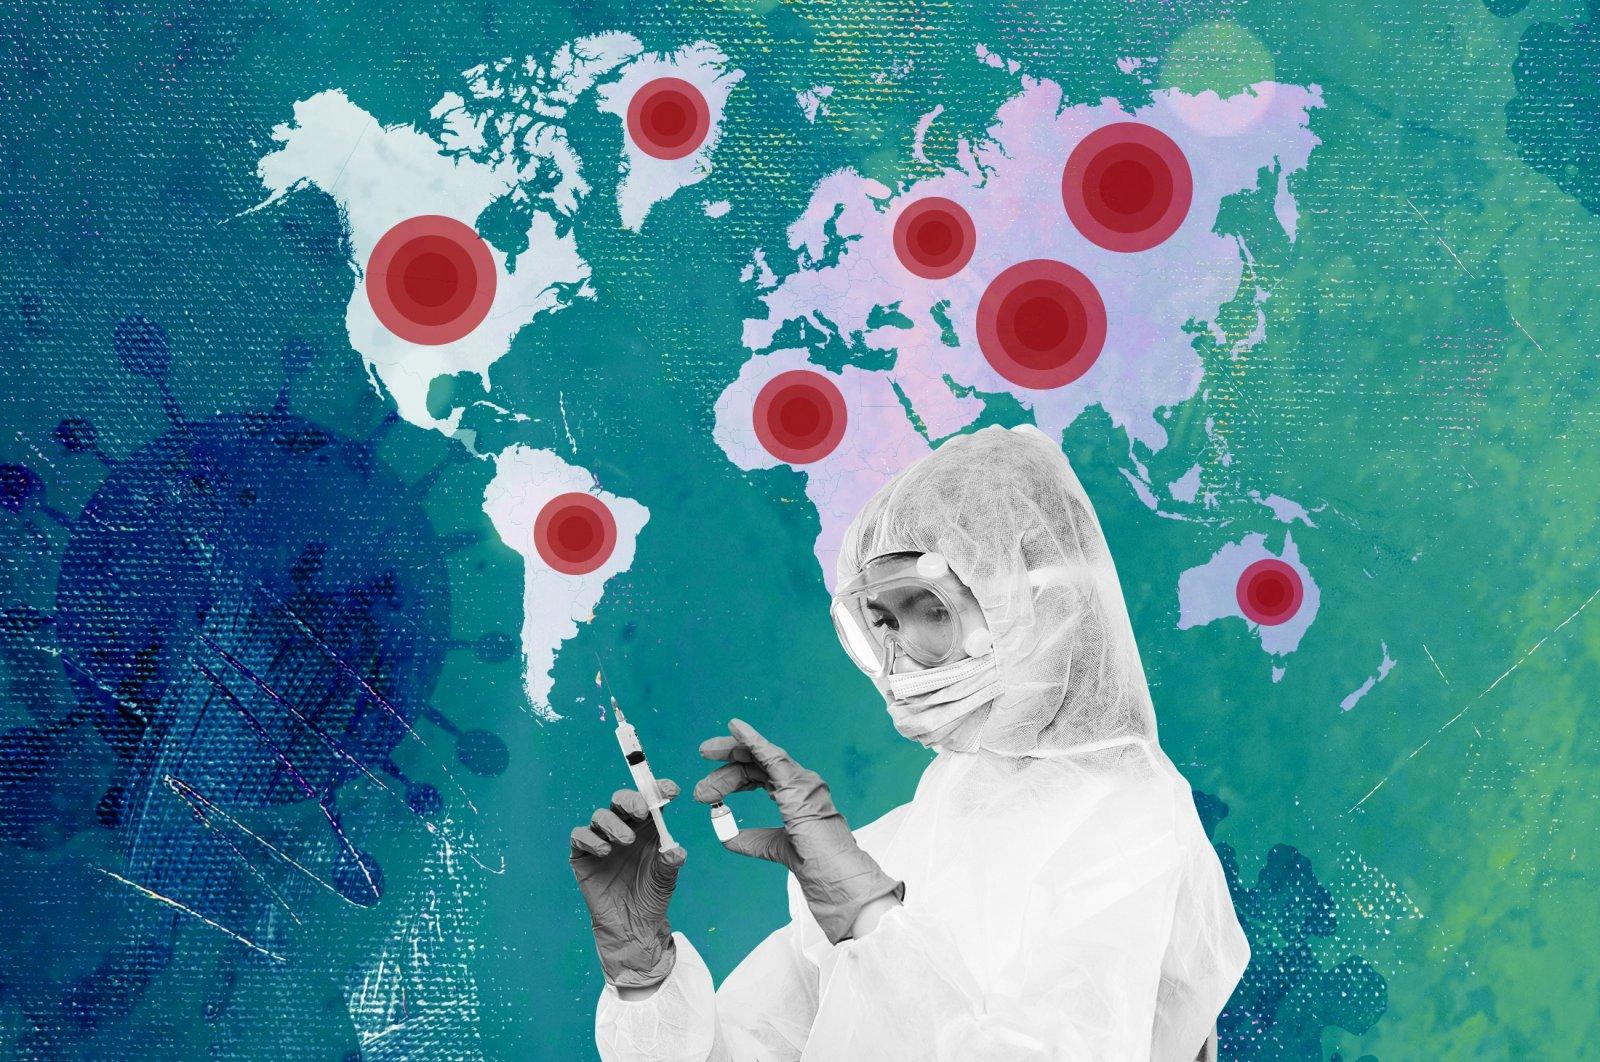 An illustration by Daily Sabah's Büşra Öztürk depicts the deadly spread of the coronavirus pandemic.